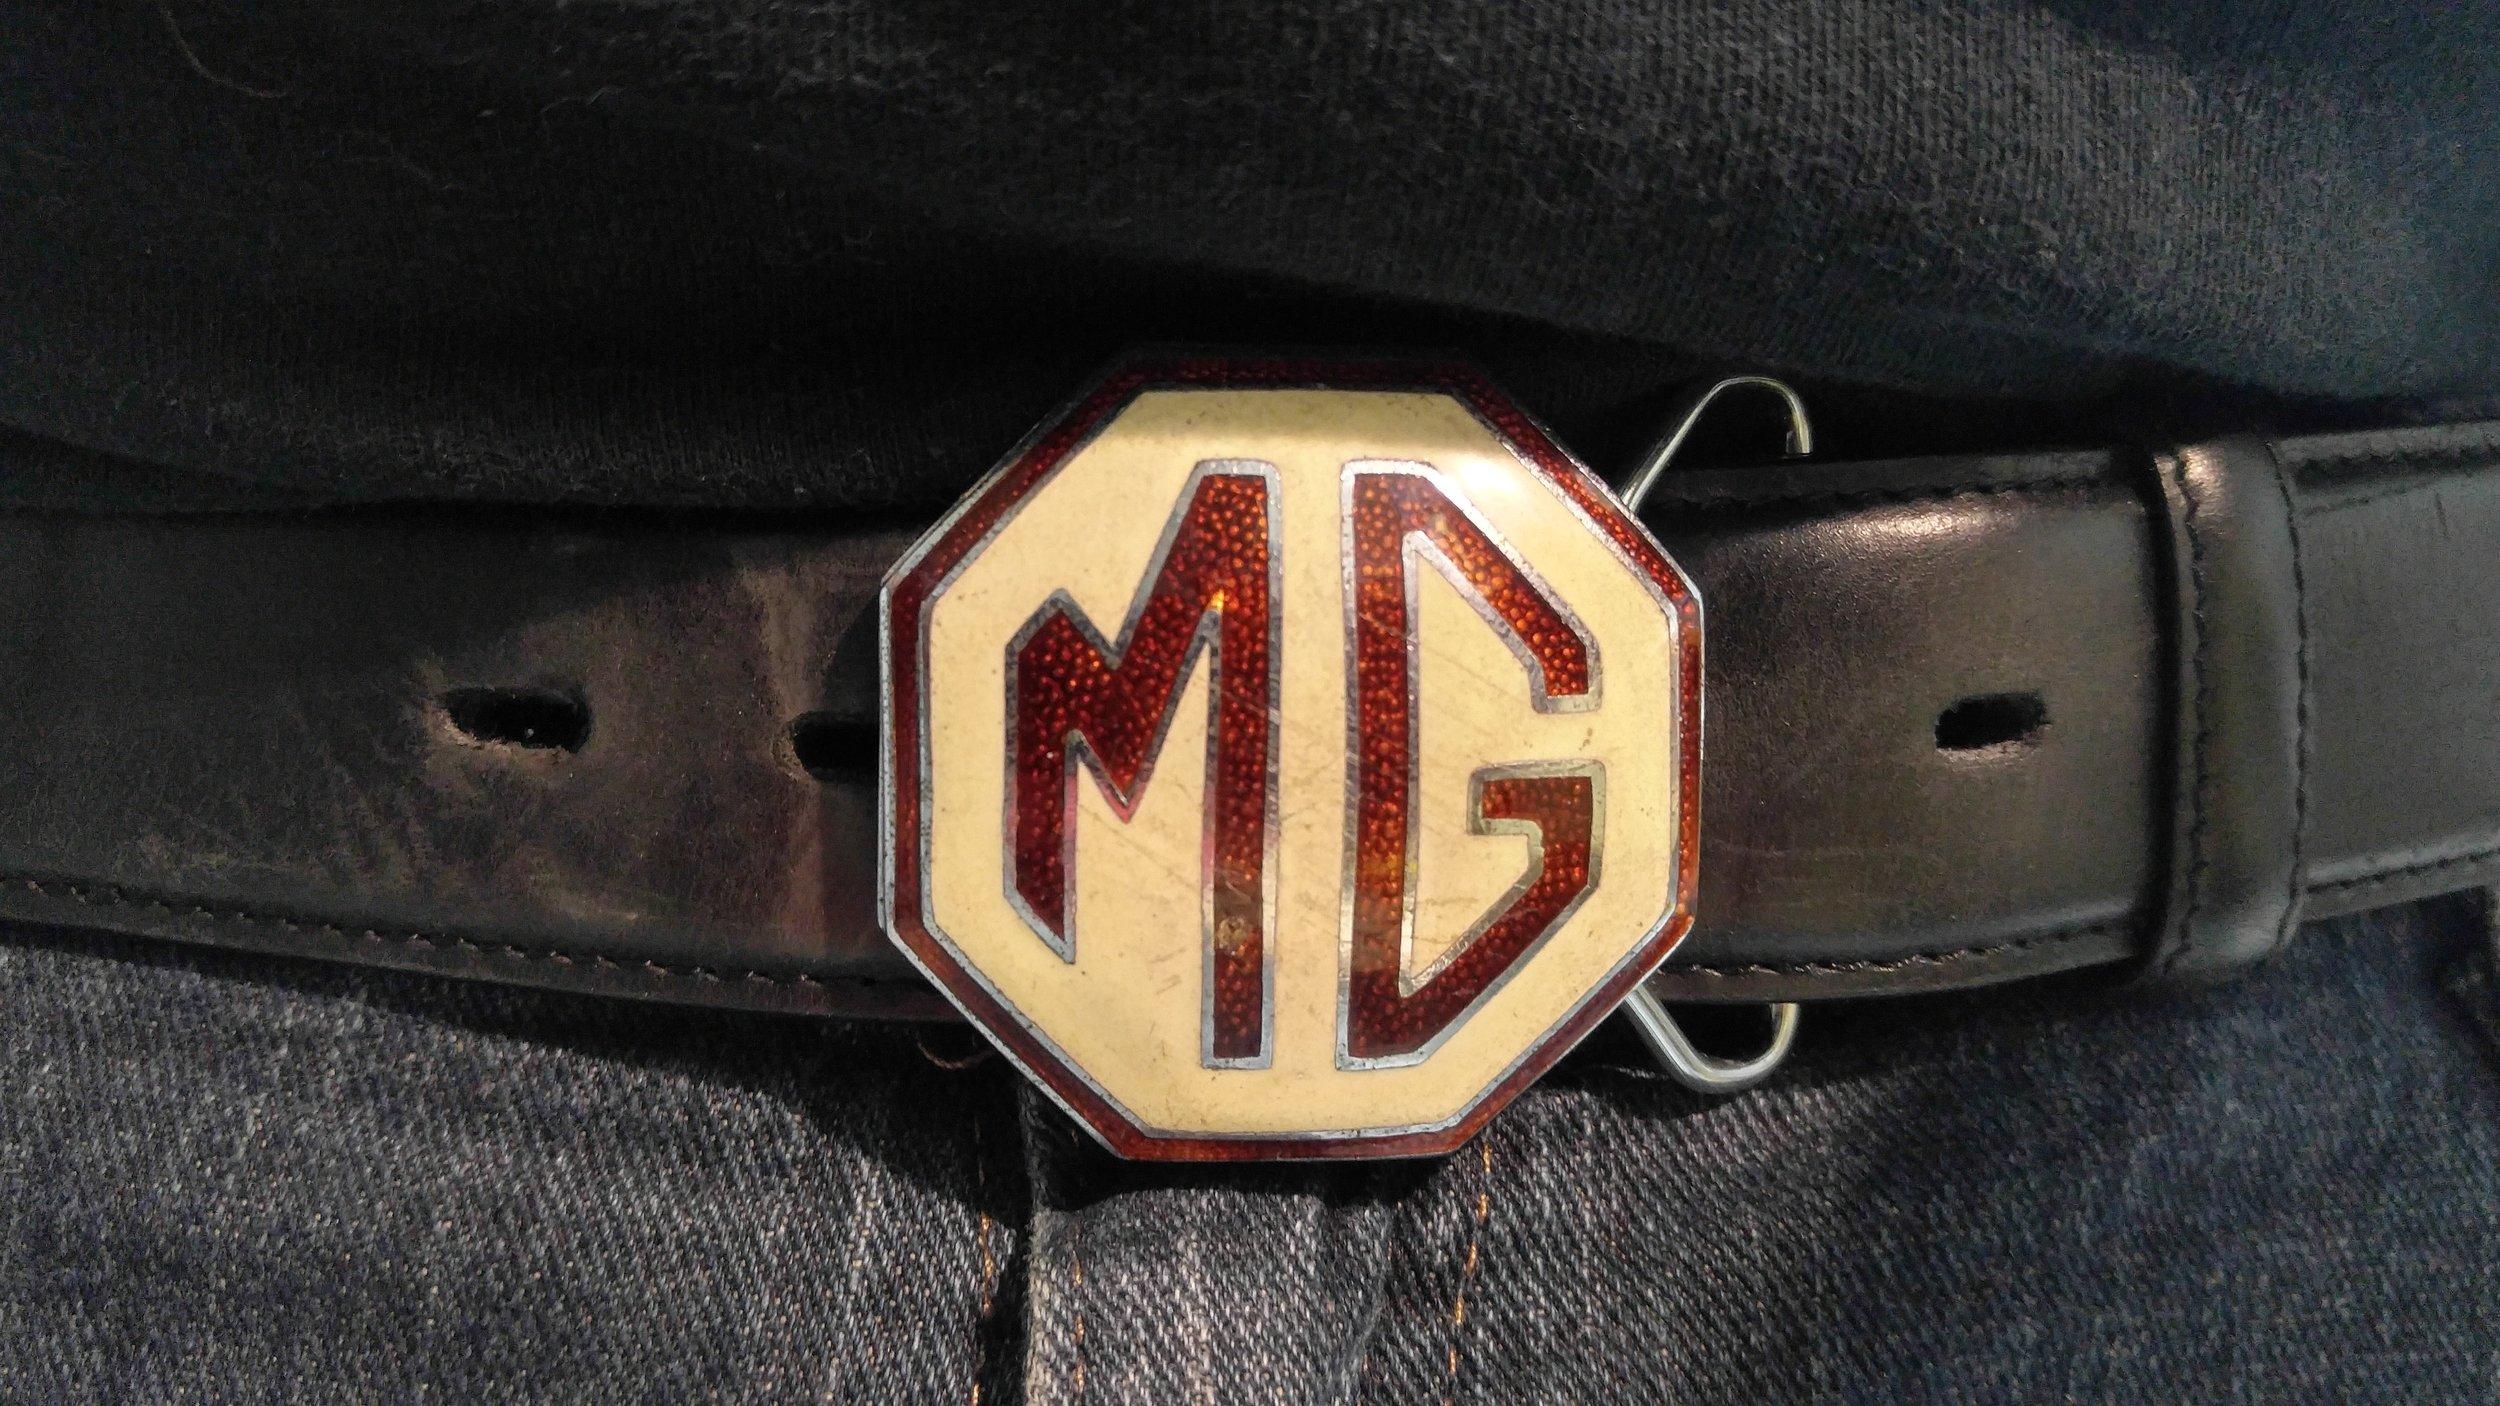 darvier-md-td-badge-belt-conversion-the-motorway.jpg